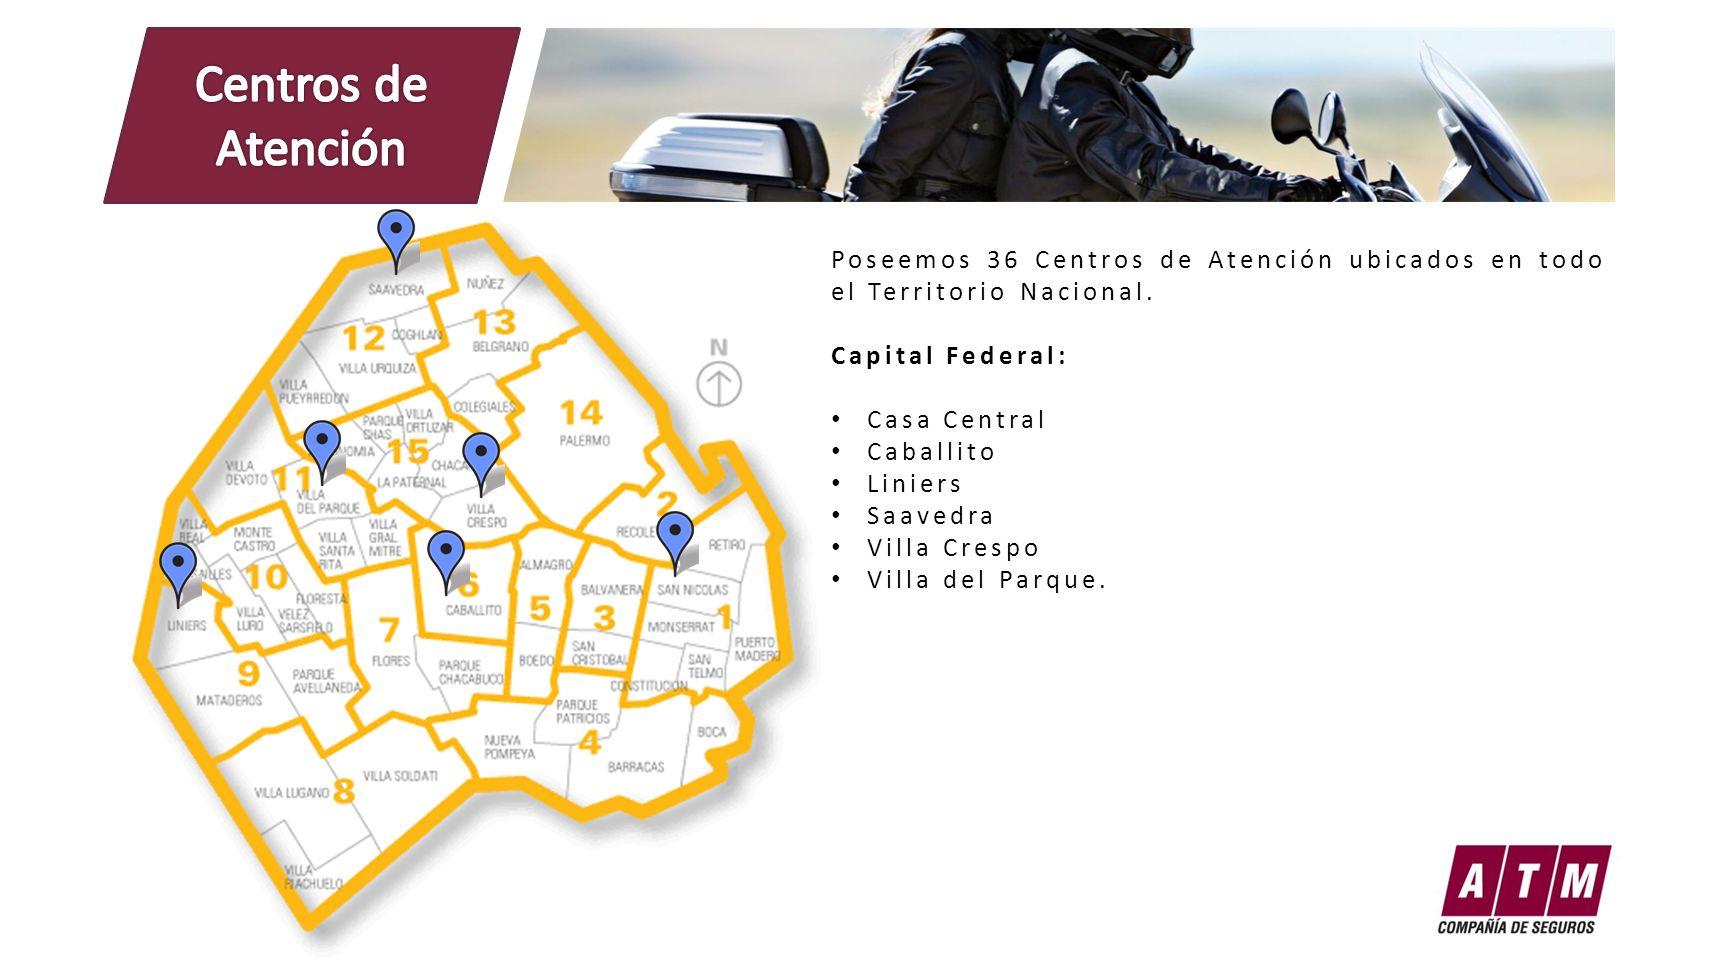 Poseemos 36 Centros de Atención ubicados en todo el Territorio Nacional. Capital Federal: Casa Central Caballito Liniers Saavedra Villa Crespo Villa d